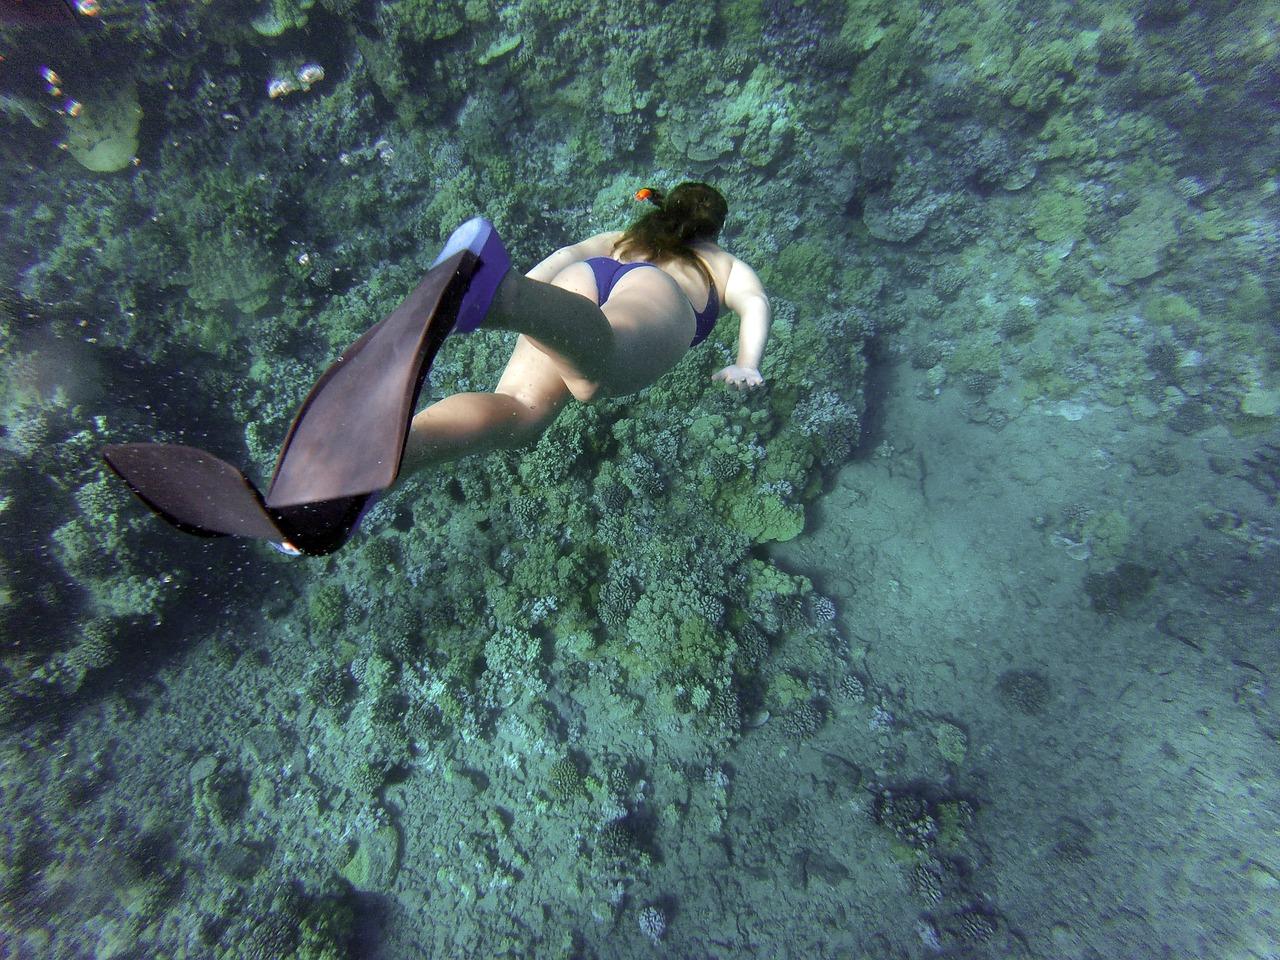 a woman snorkelling at Casalabate's Underwater Secret